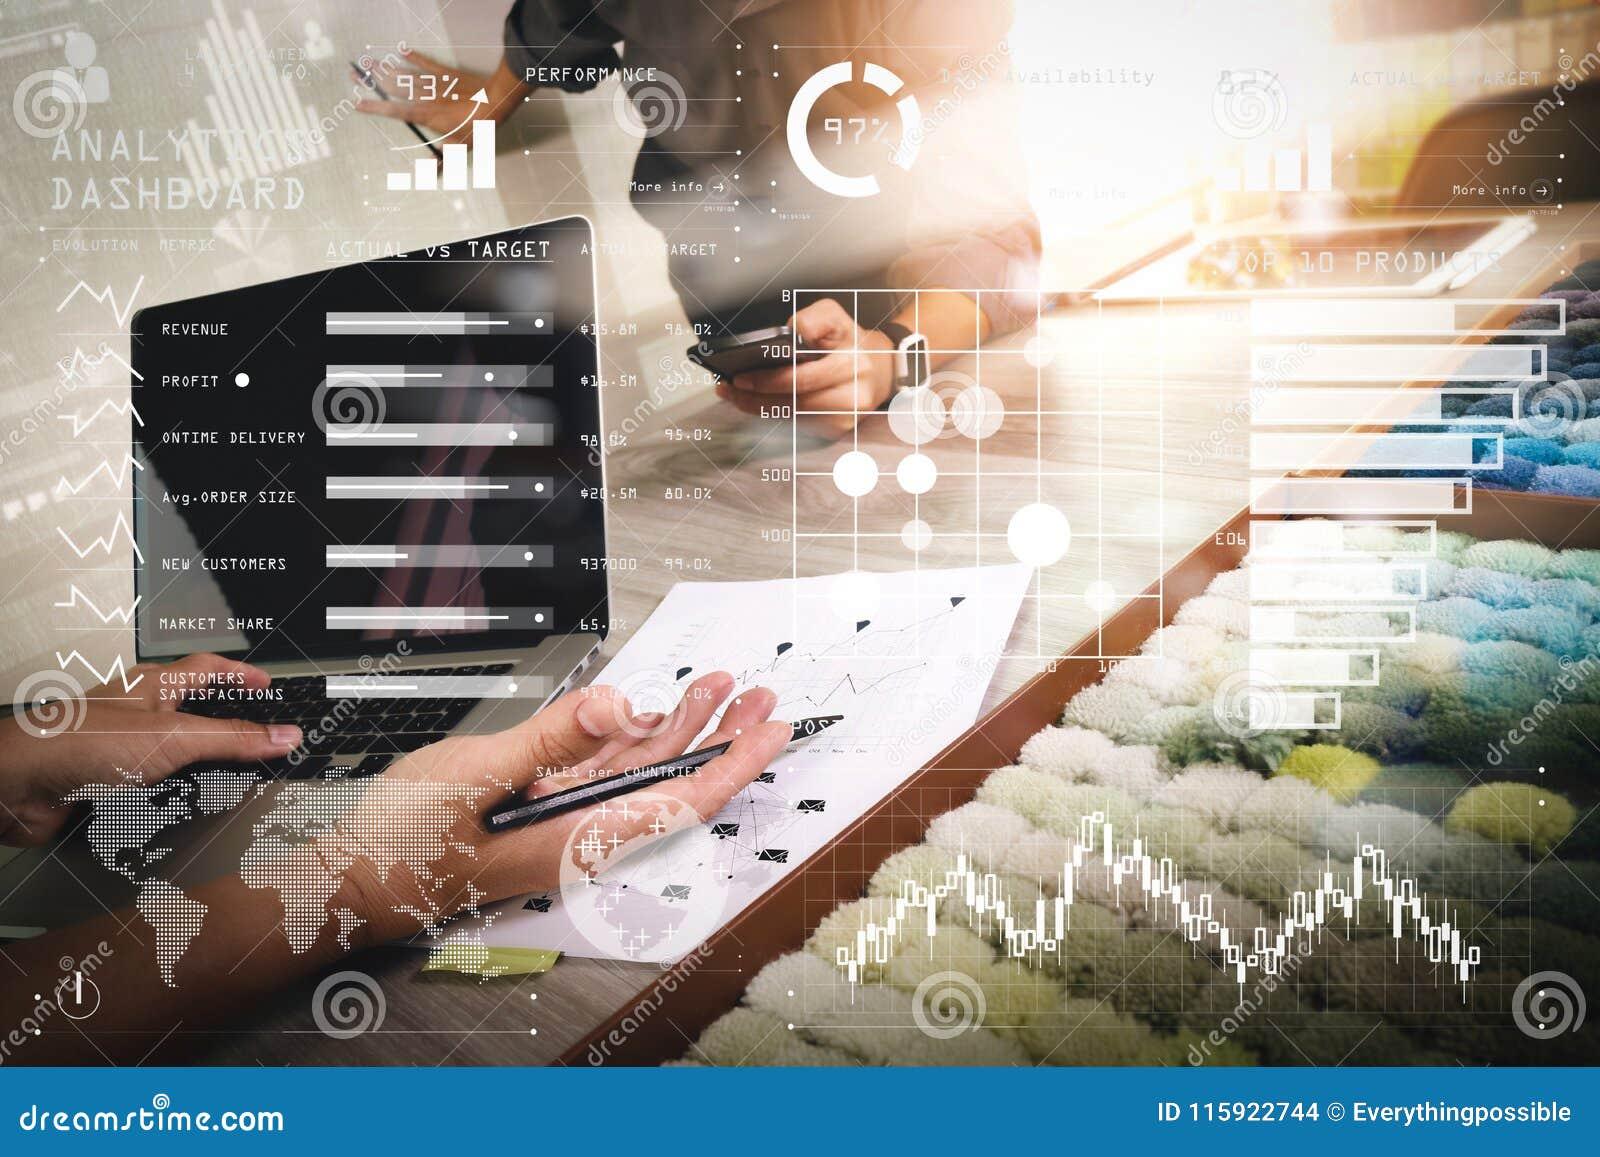 Colleagues interior designers discussing data with new - Interior design industry statistics ...